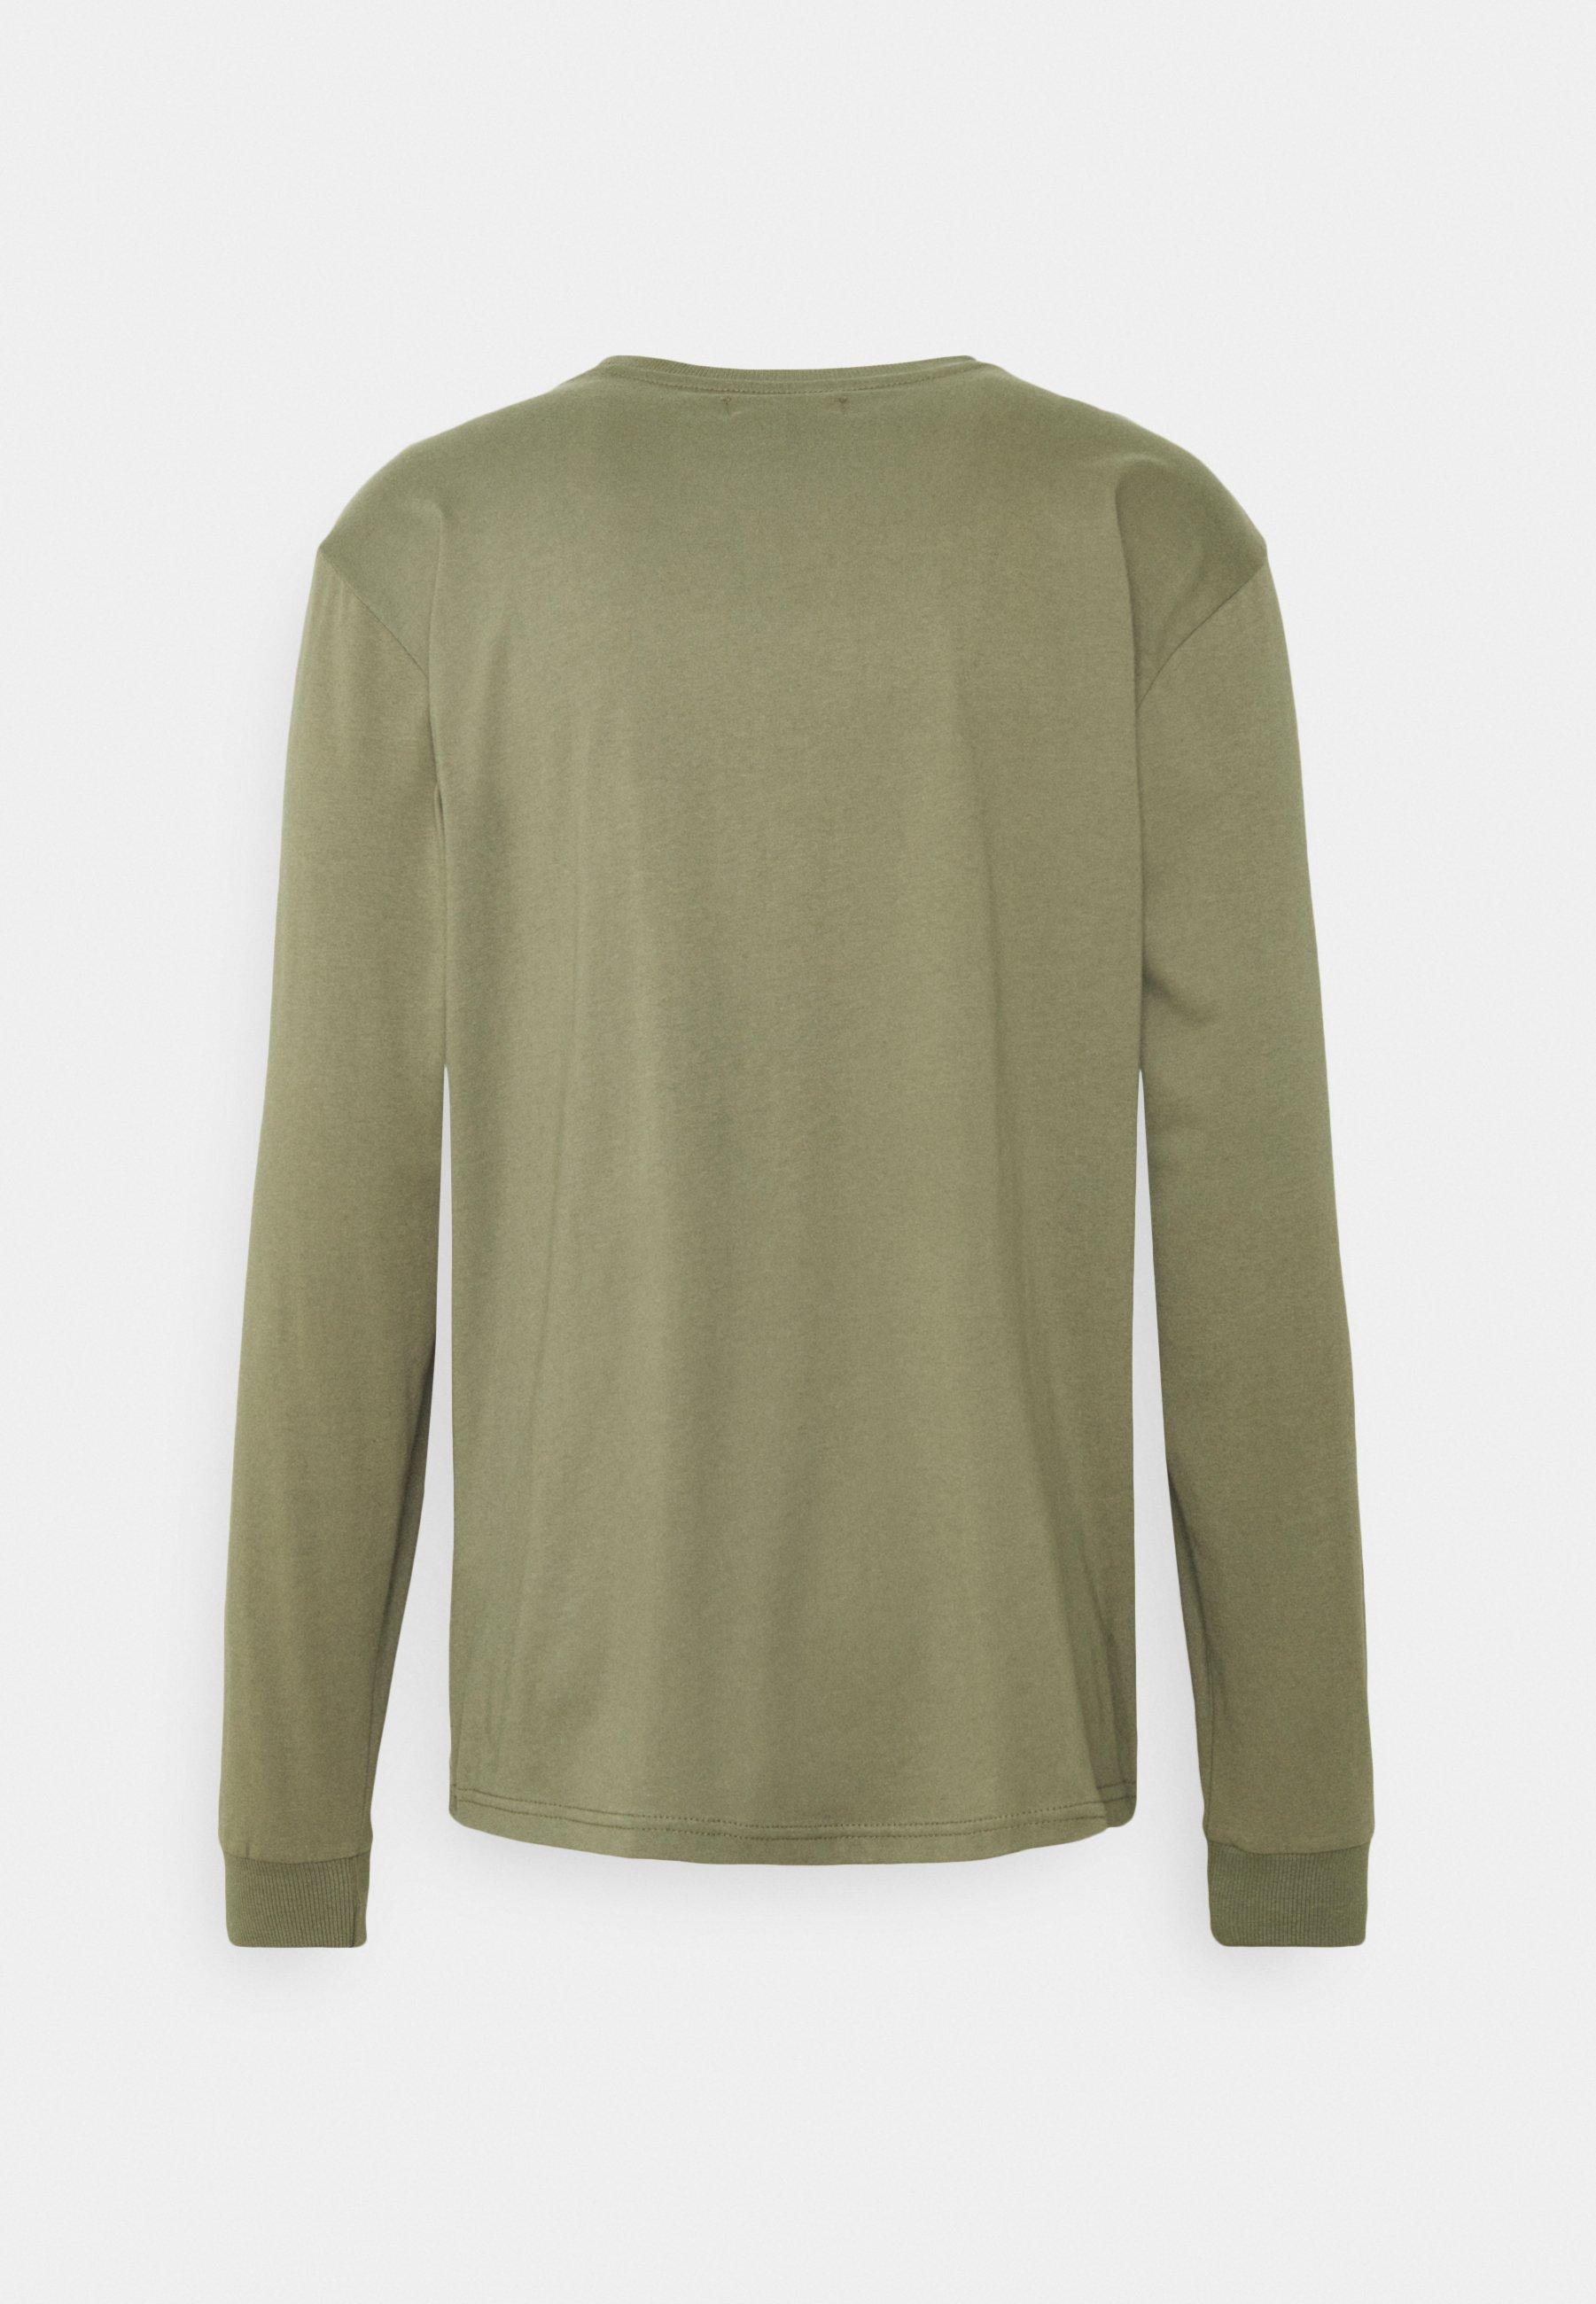 Urban Threads Front Graphic Long Sleeve Tee - Langarmshirt Khaki